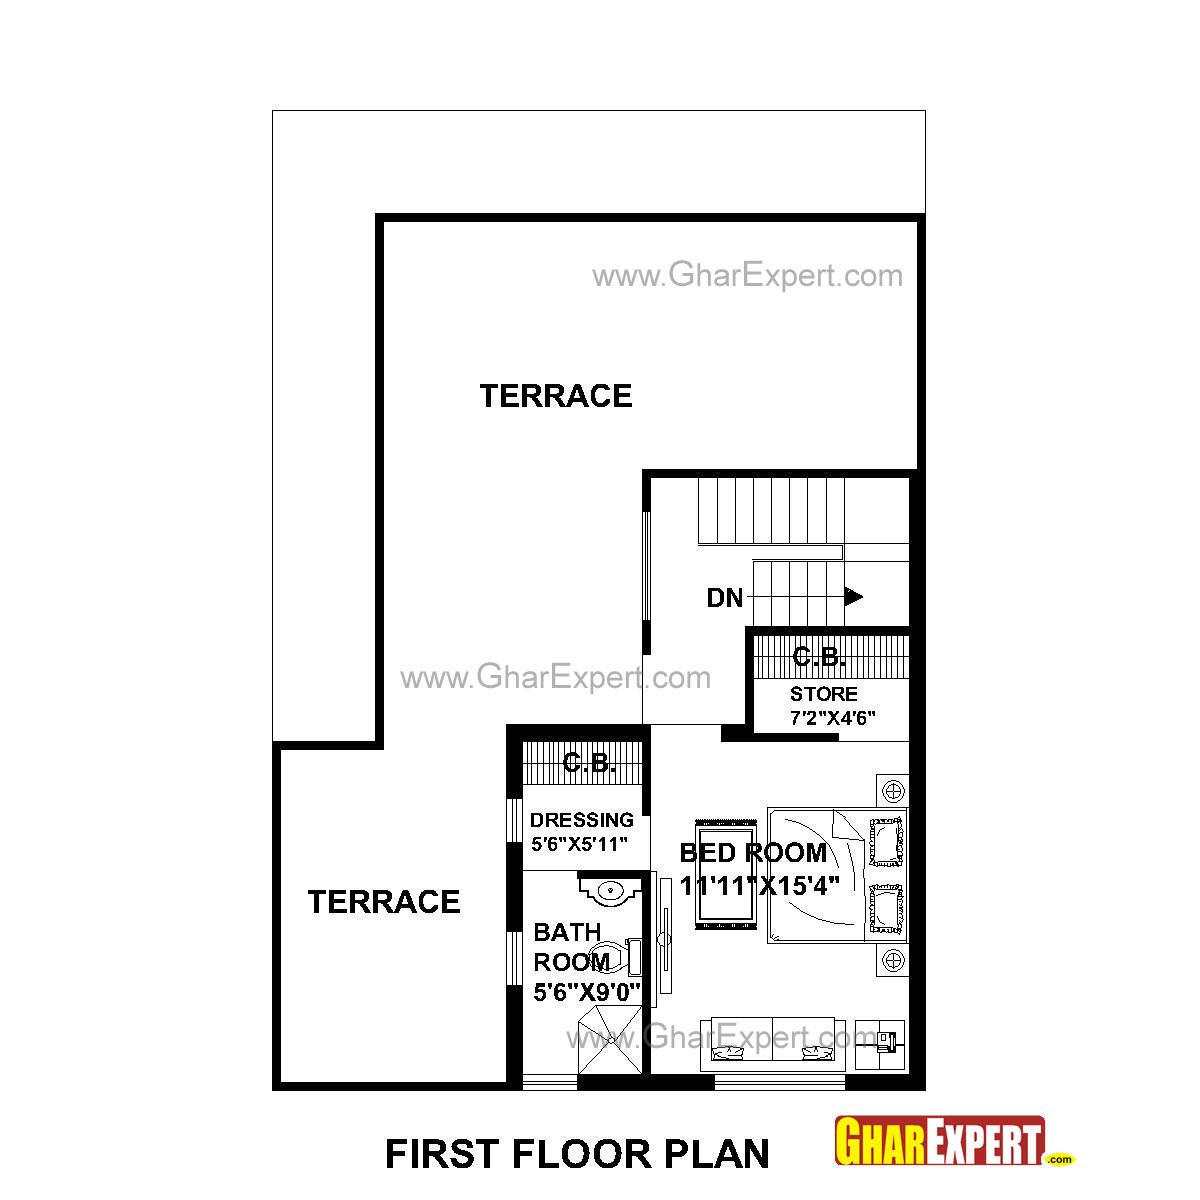 House Plan for 30 Feet by 45 Feet plot (Plot Size 150